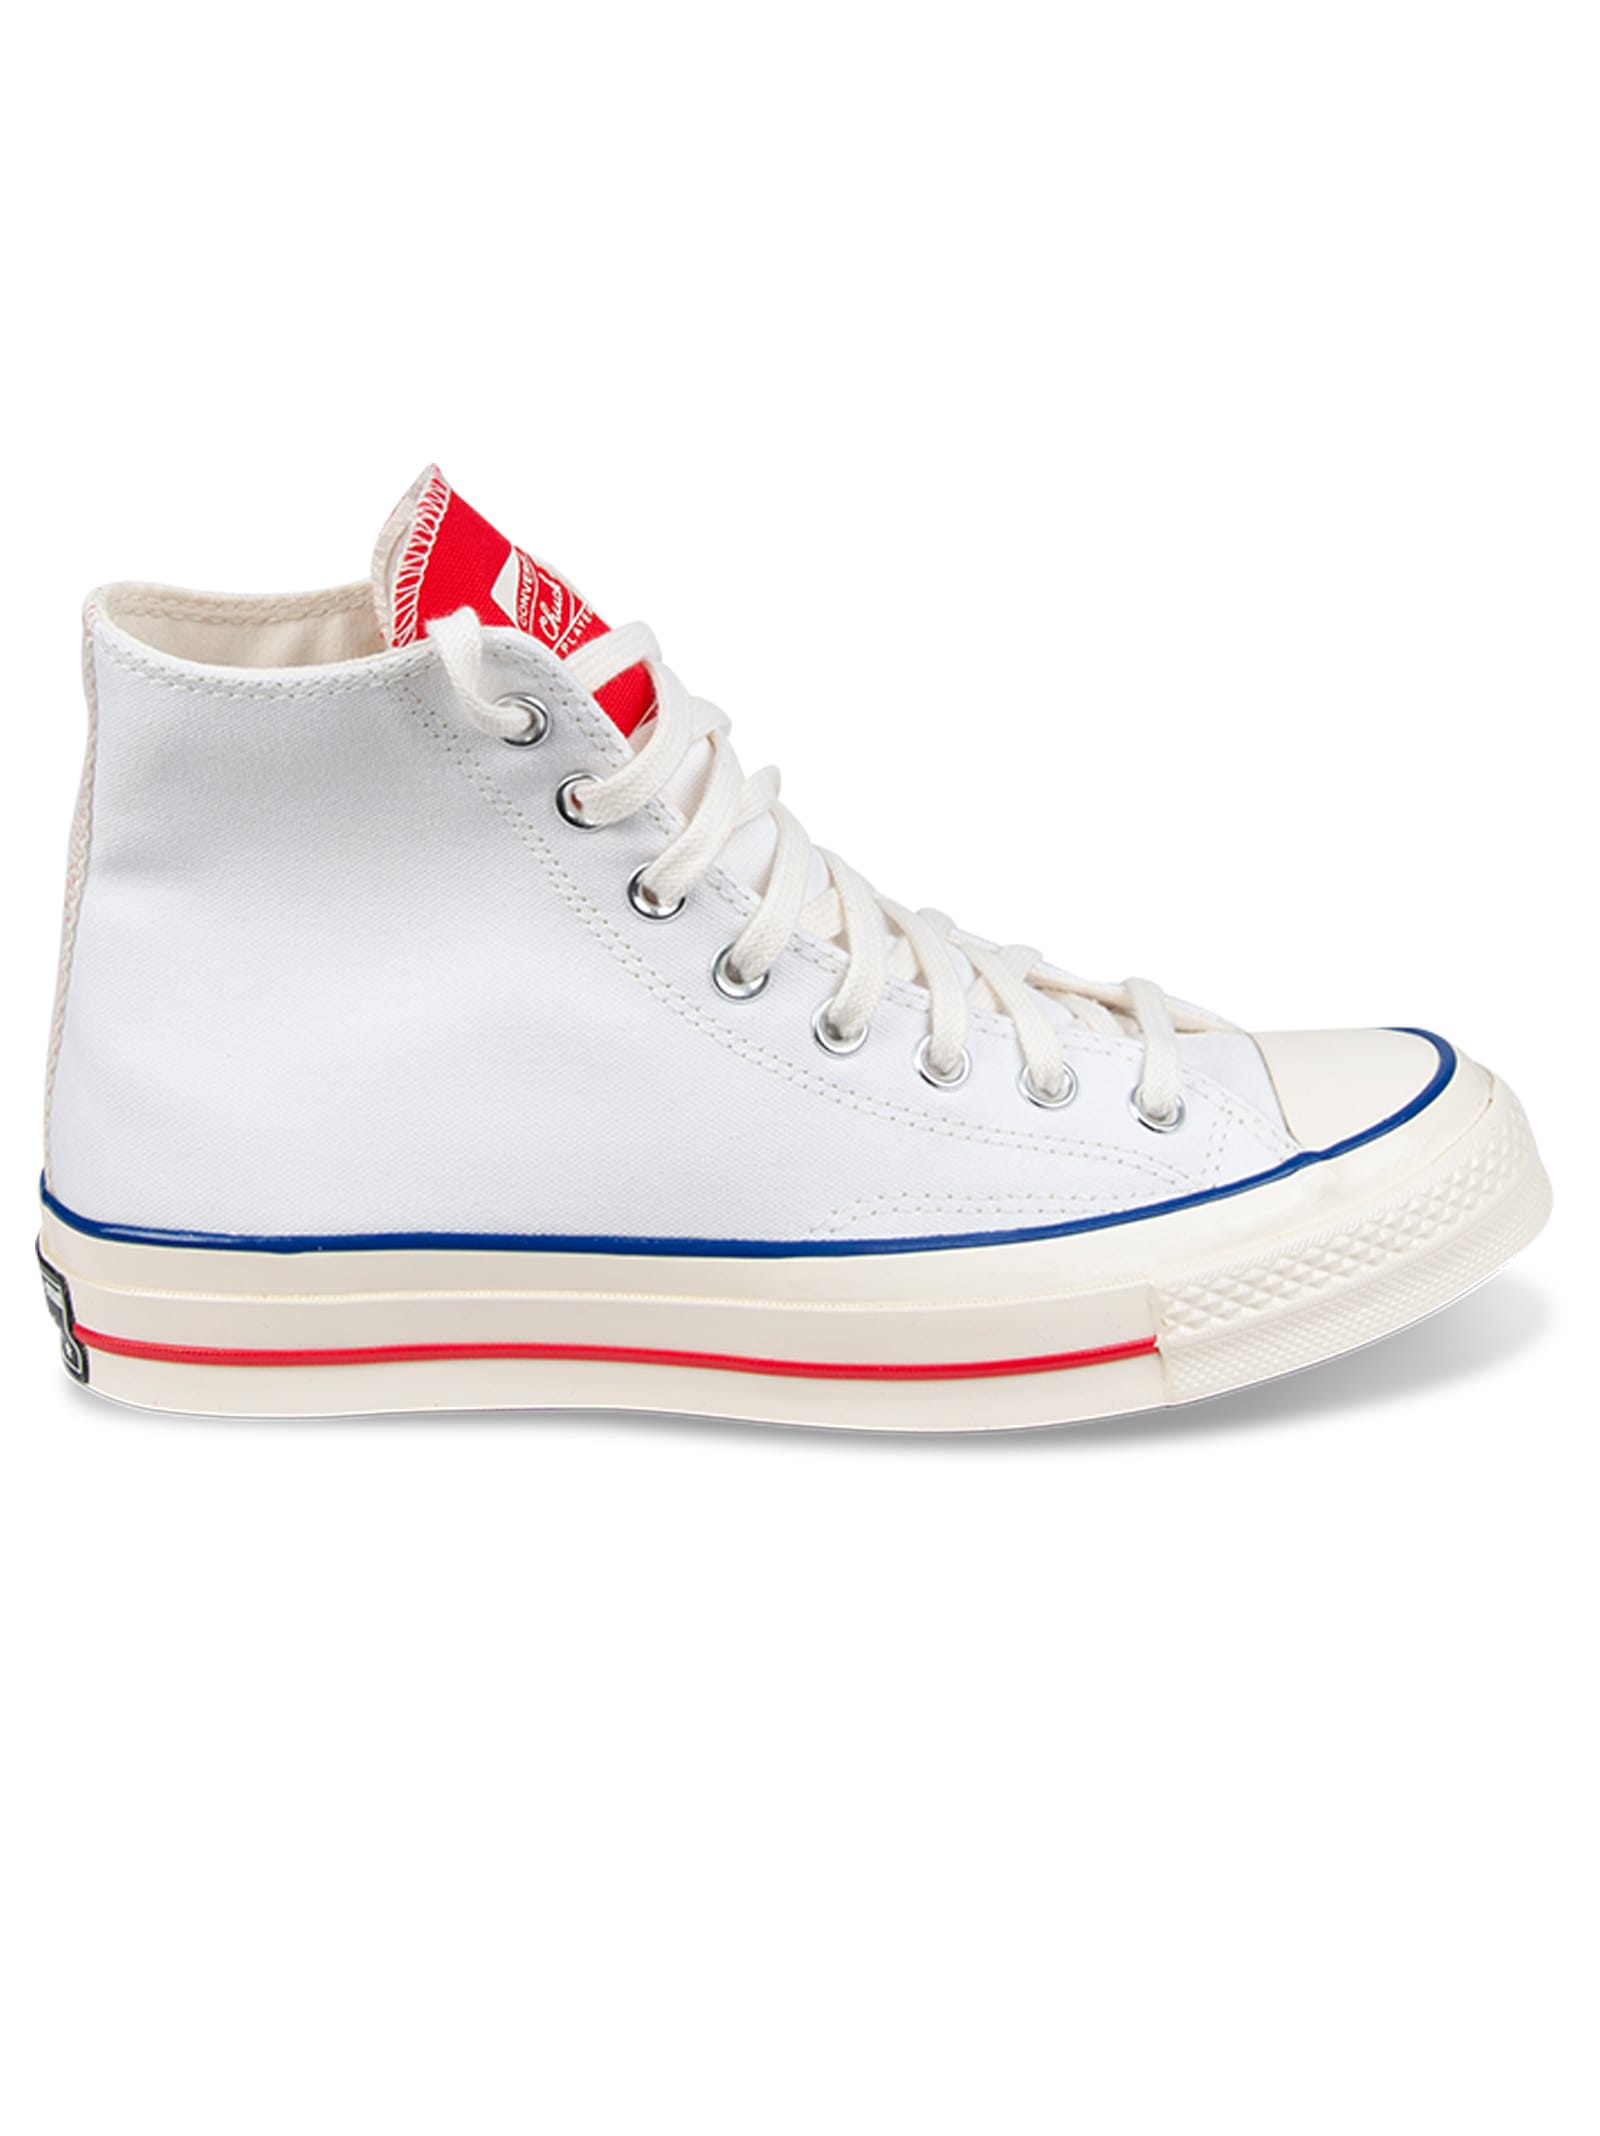 Converse Sneakers | italist, ALWAYS LIKE A SALE